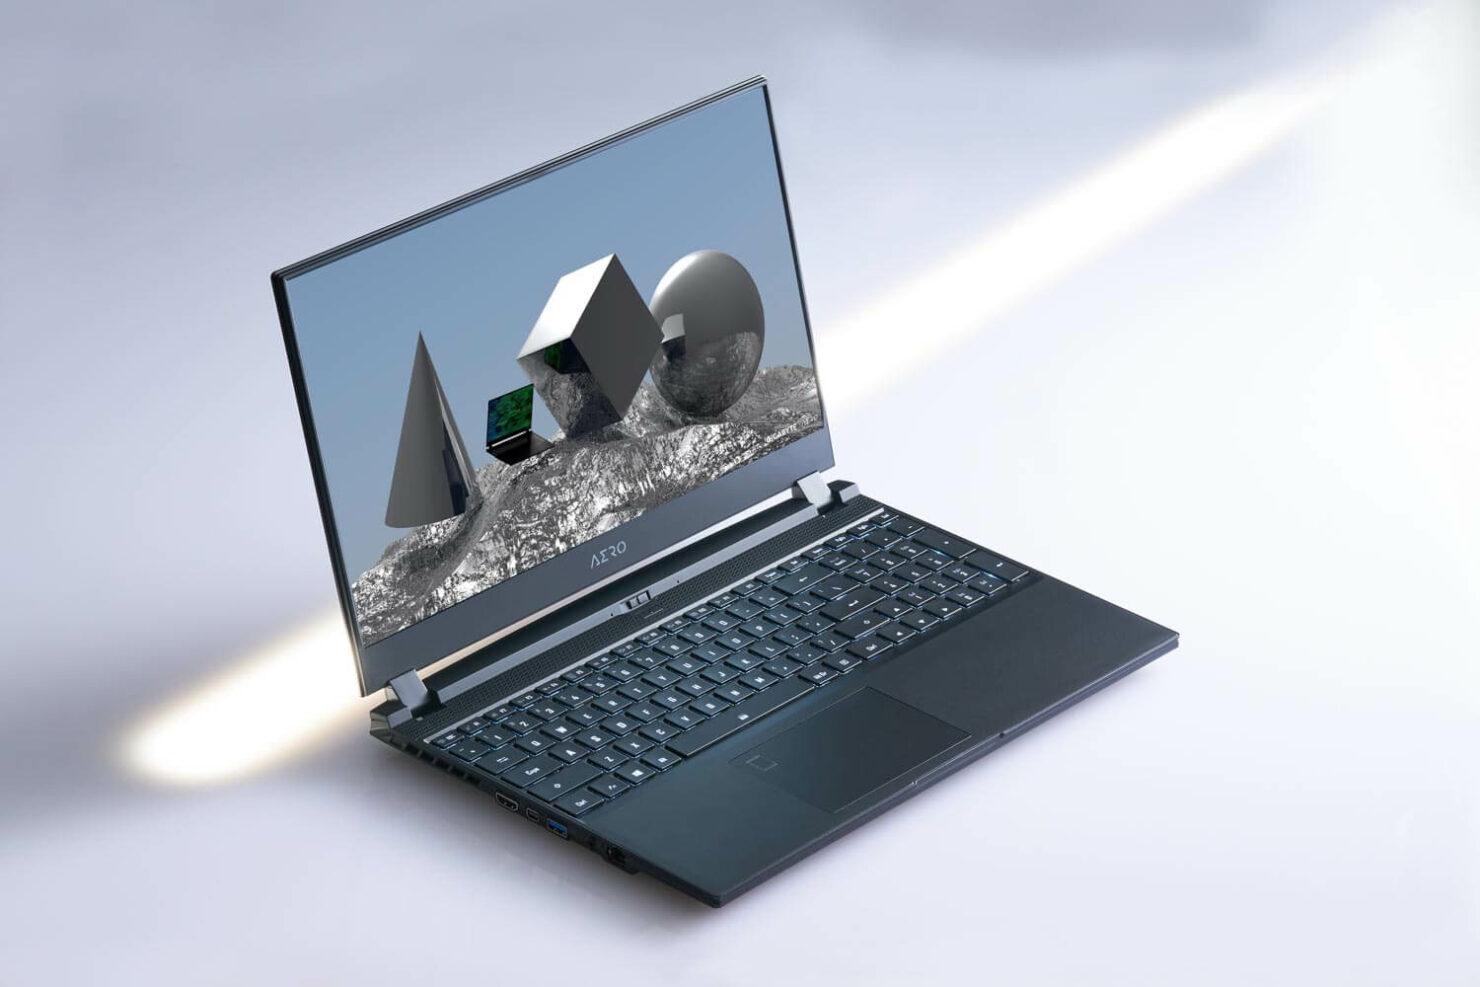 aero-intel-11th-gen-laptop-1-1